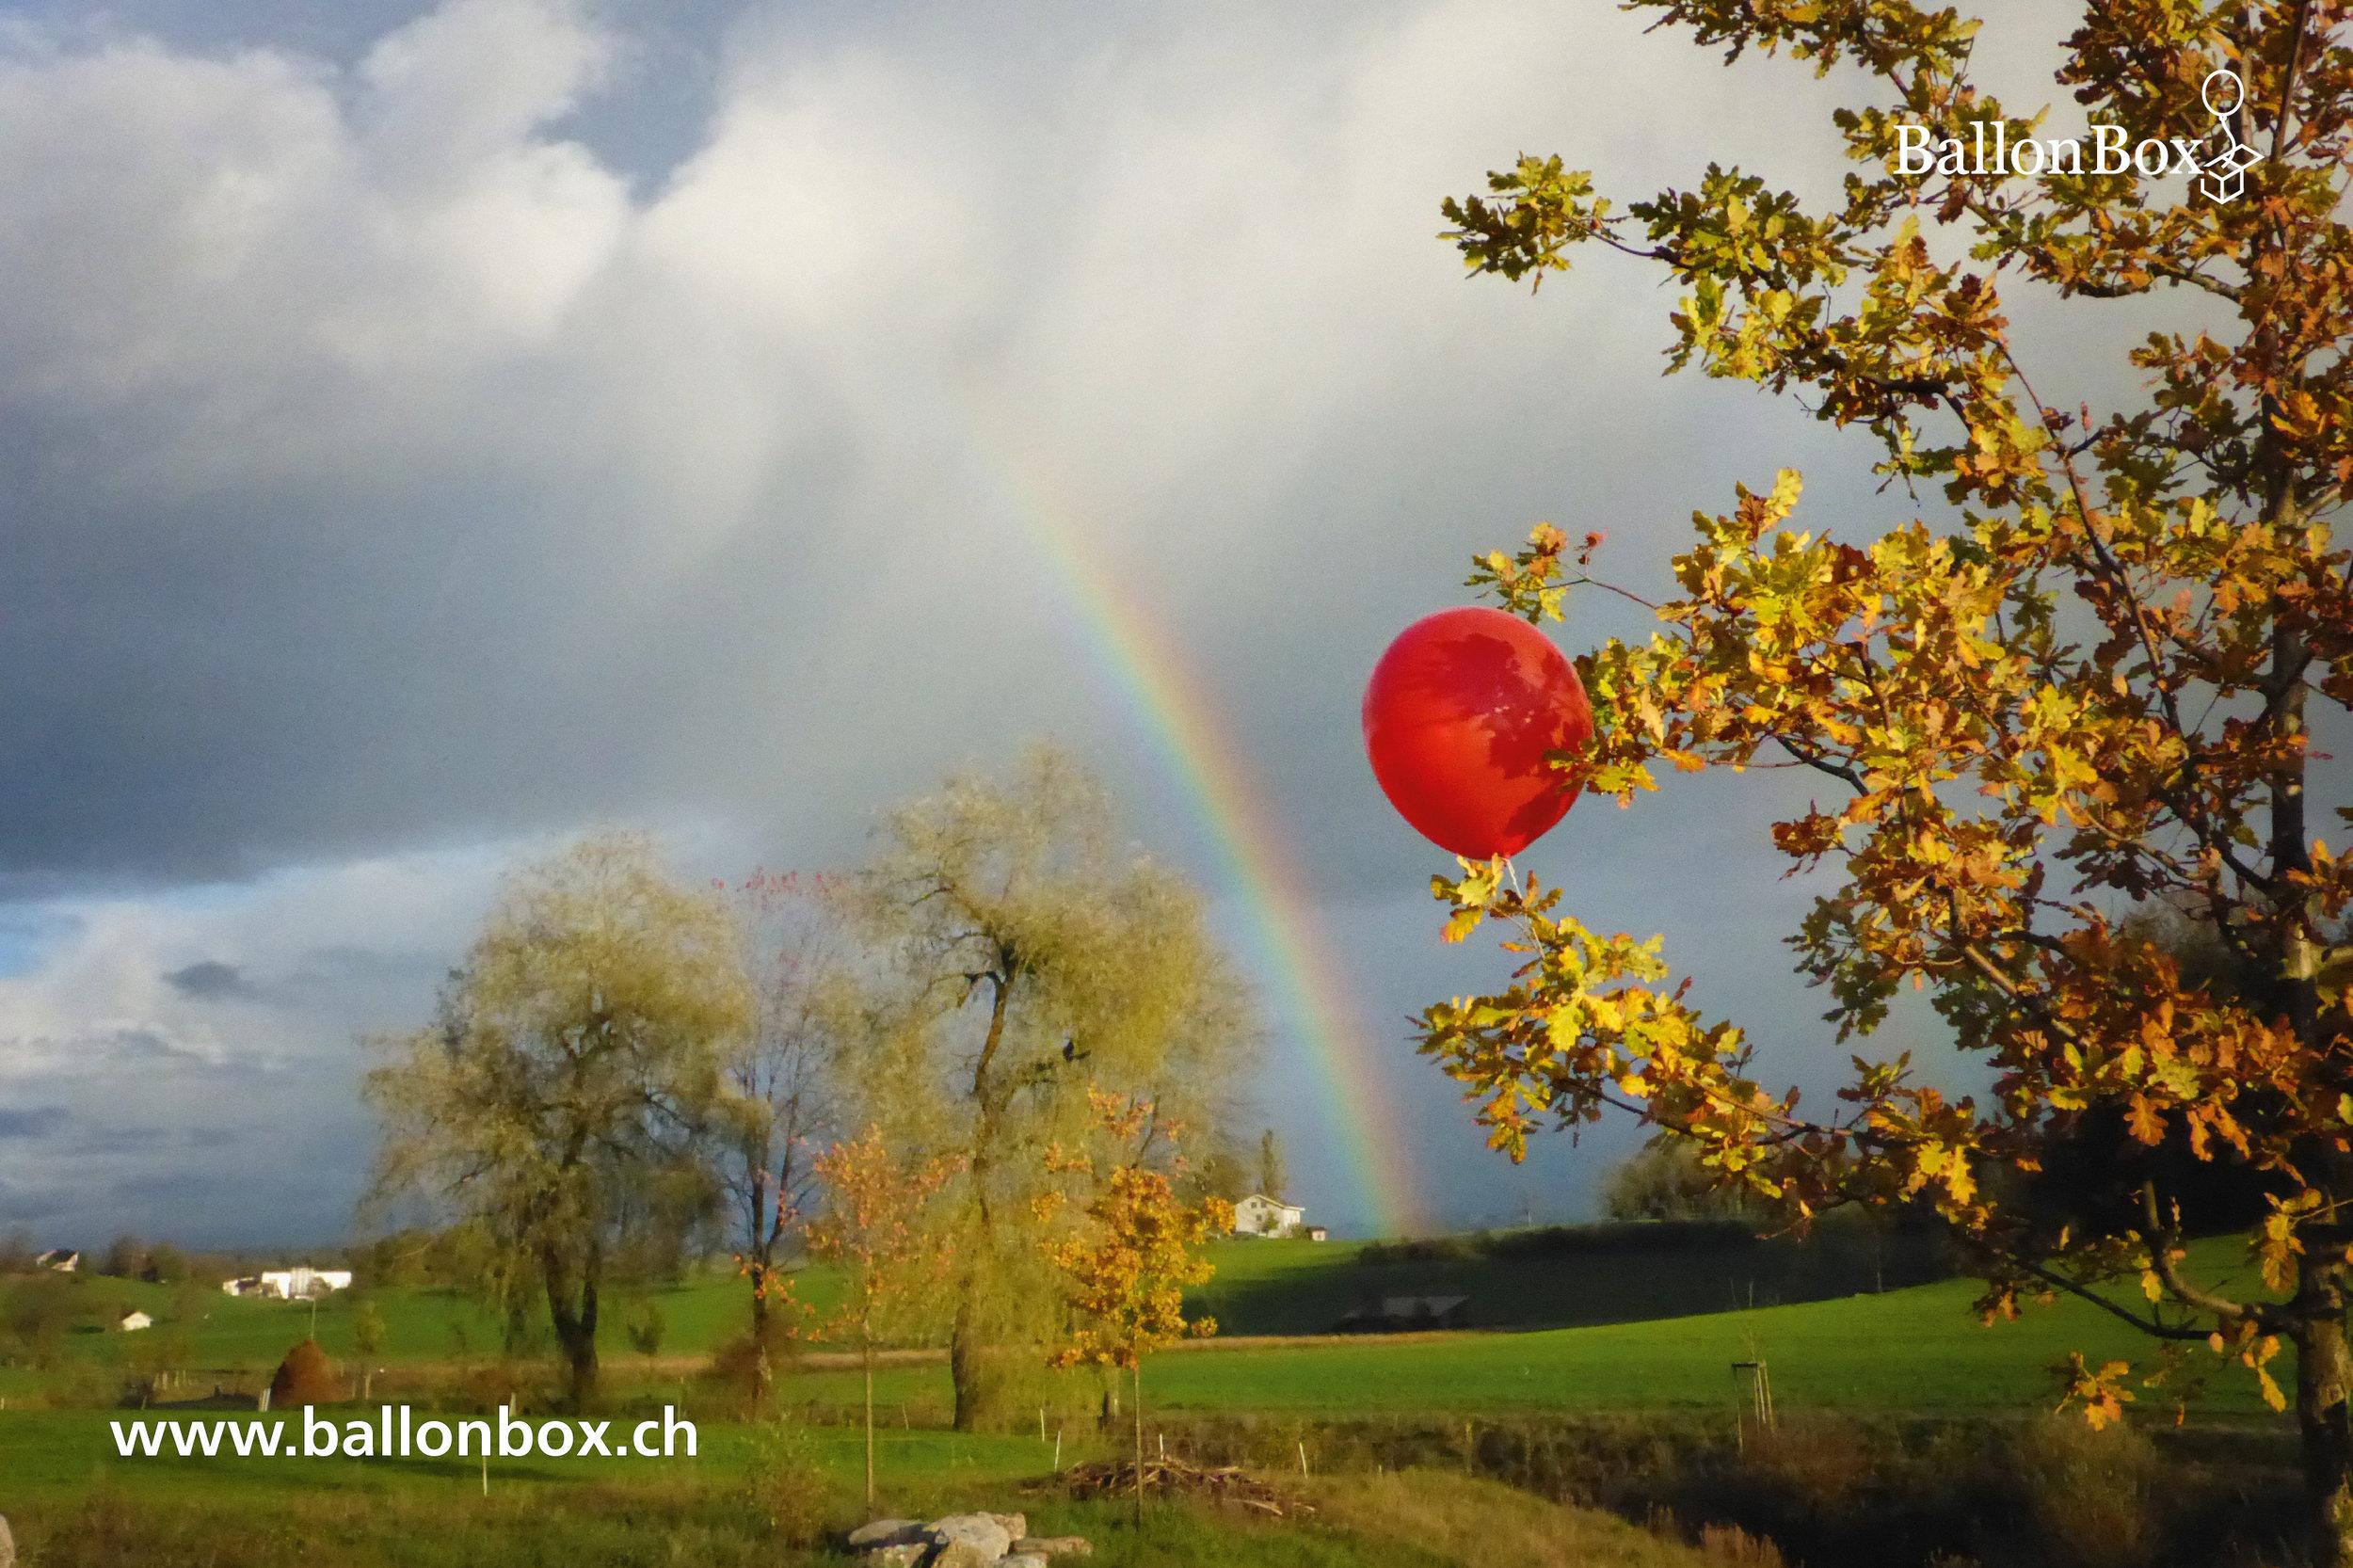 BallonBox_Kalender_19-10.jpg